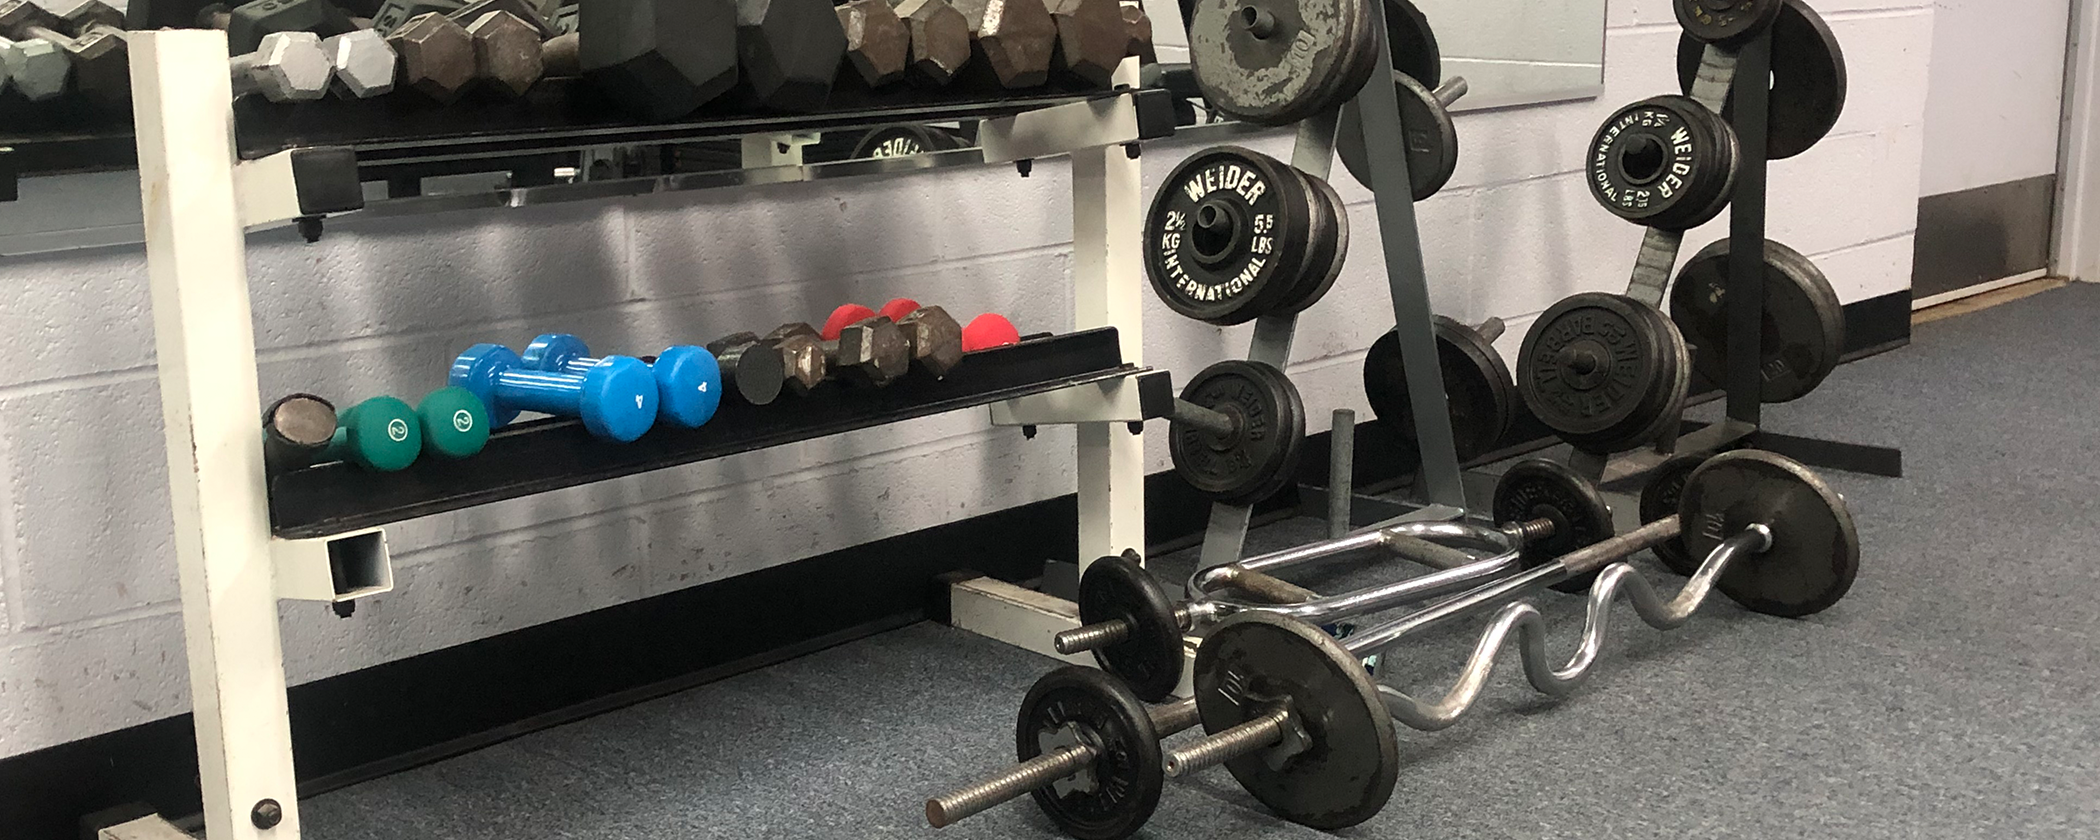 Weight & Fitness Room